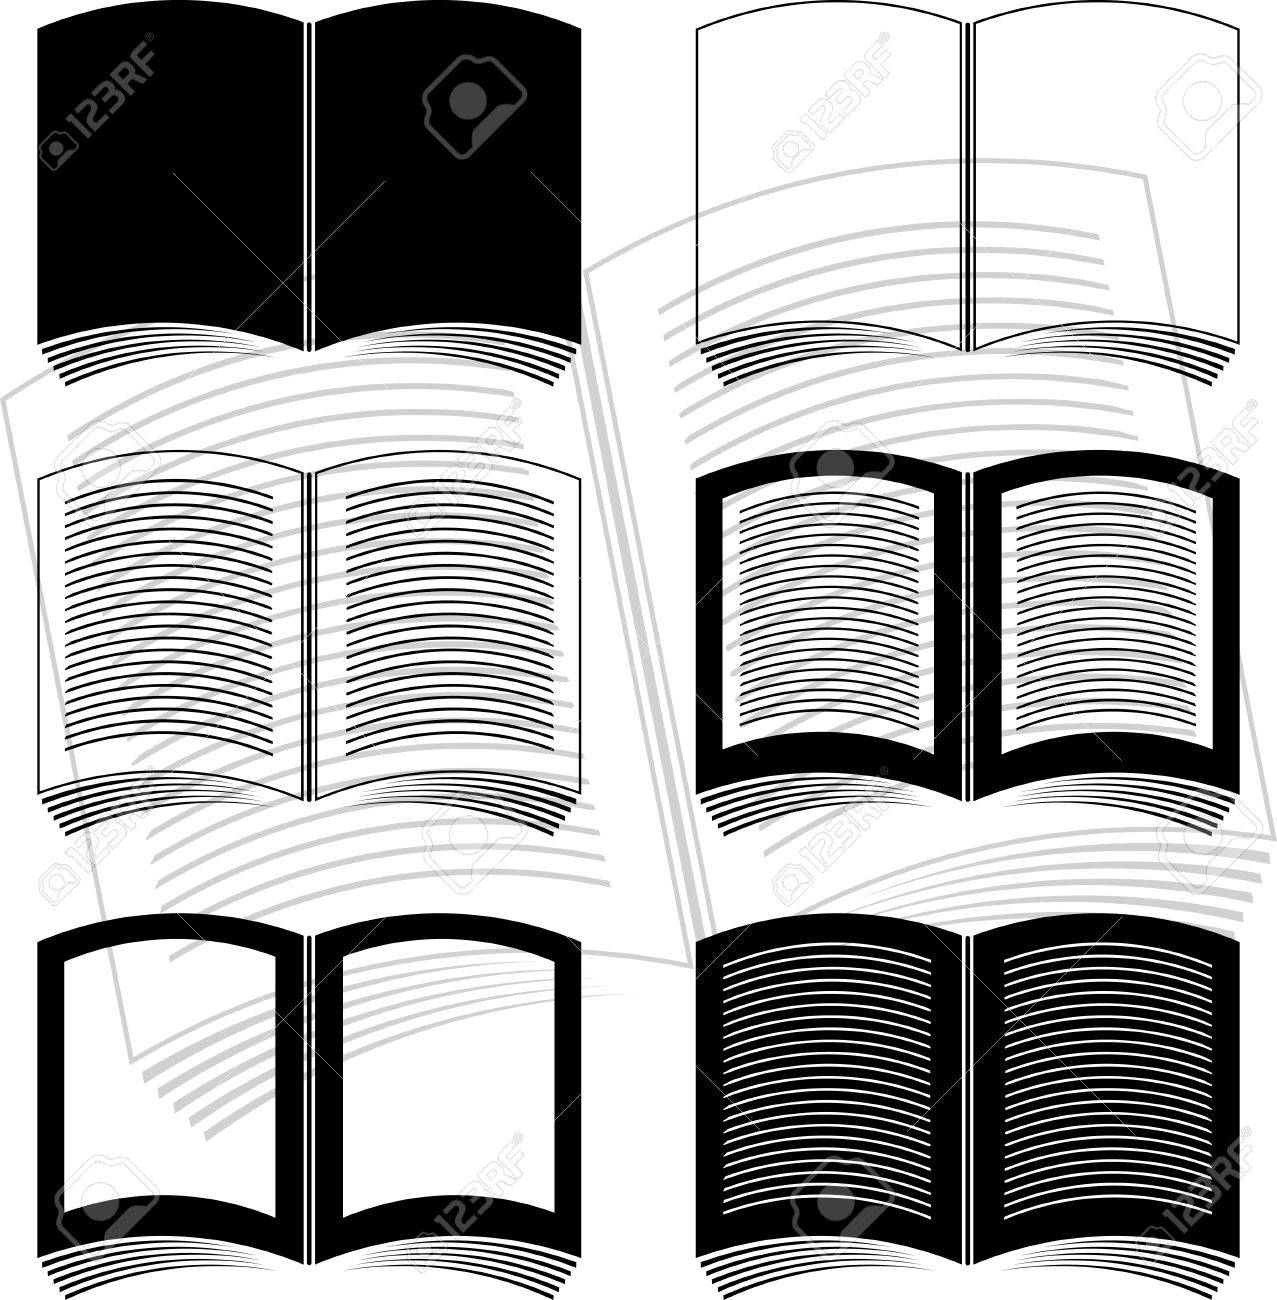 stencils of books. vector illustration Stock Vector - 9453395